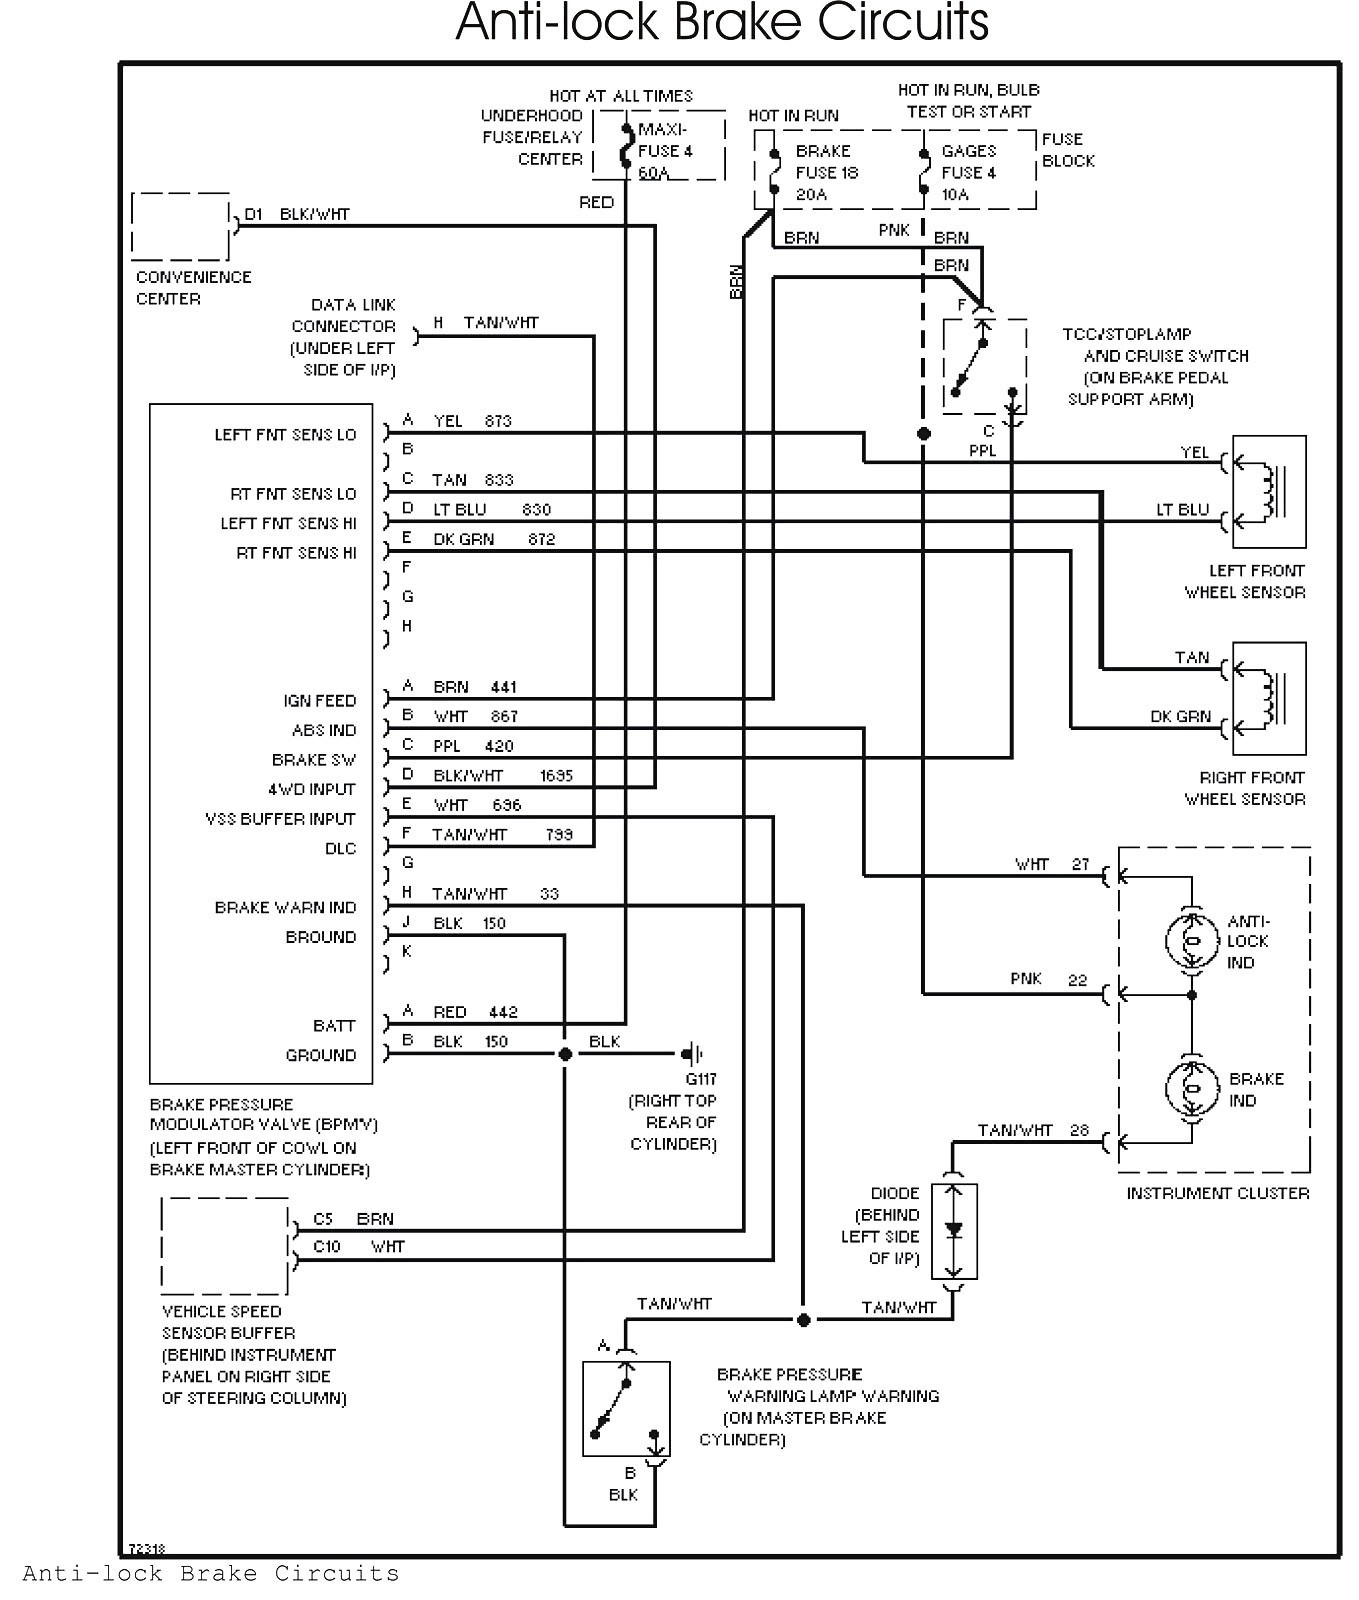 hight resolution of trailer breakaway kit wiring diagram recent trailer breakaway switch wiring diagram s le